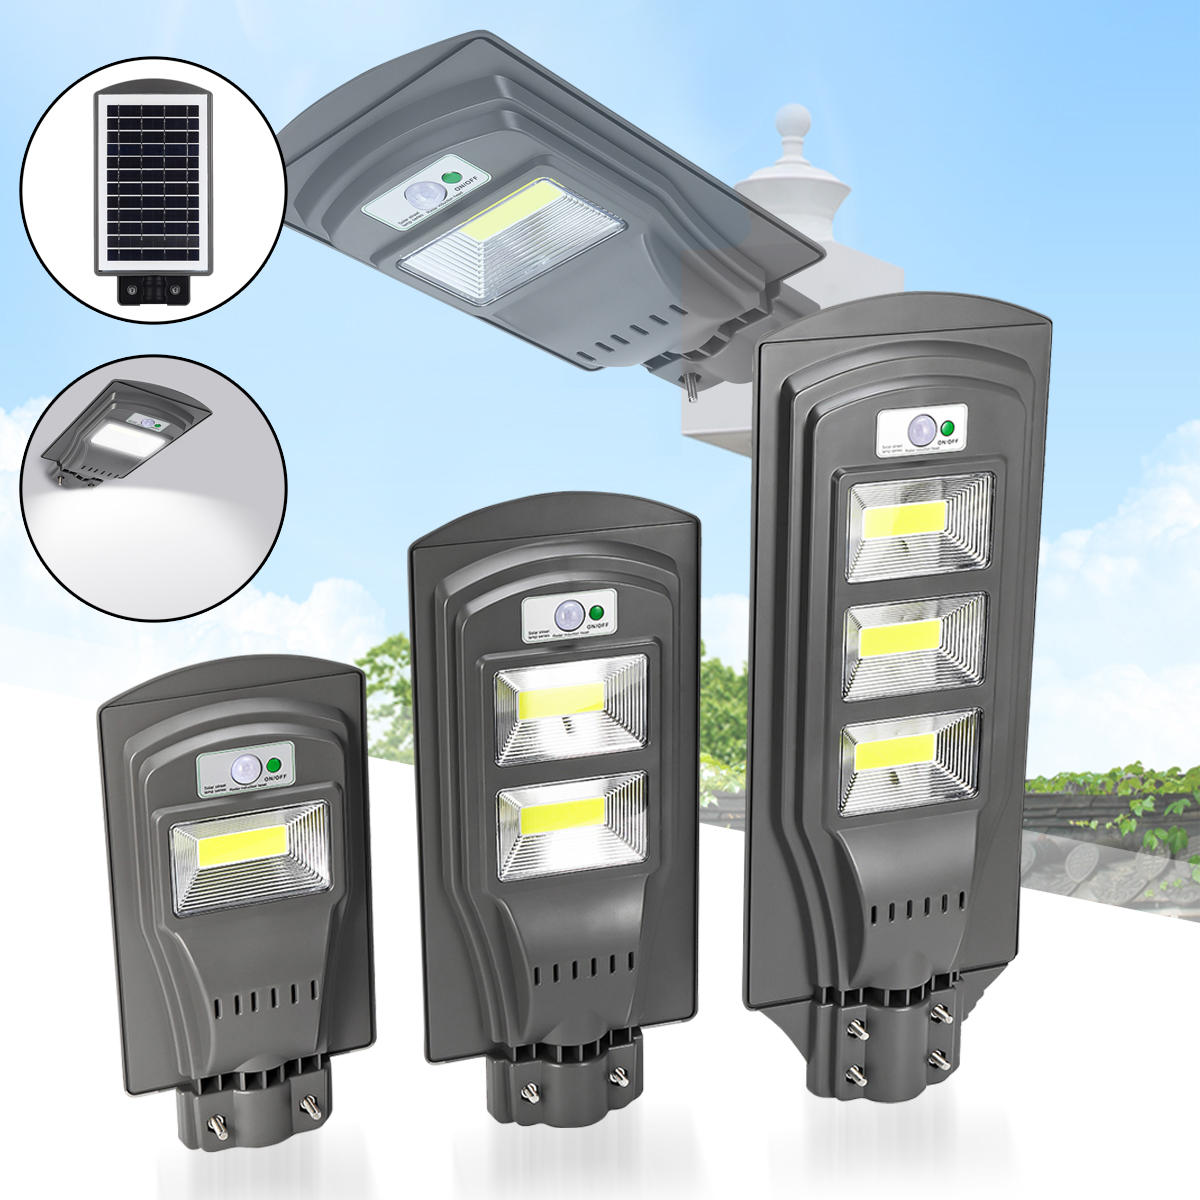 20W 40W 60W Solar Powered PIR Motion Sensor Street Lamp Outdoor Garden Yard  Light